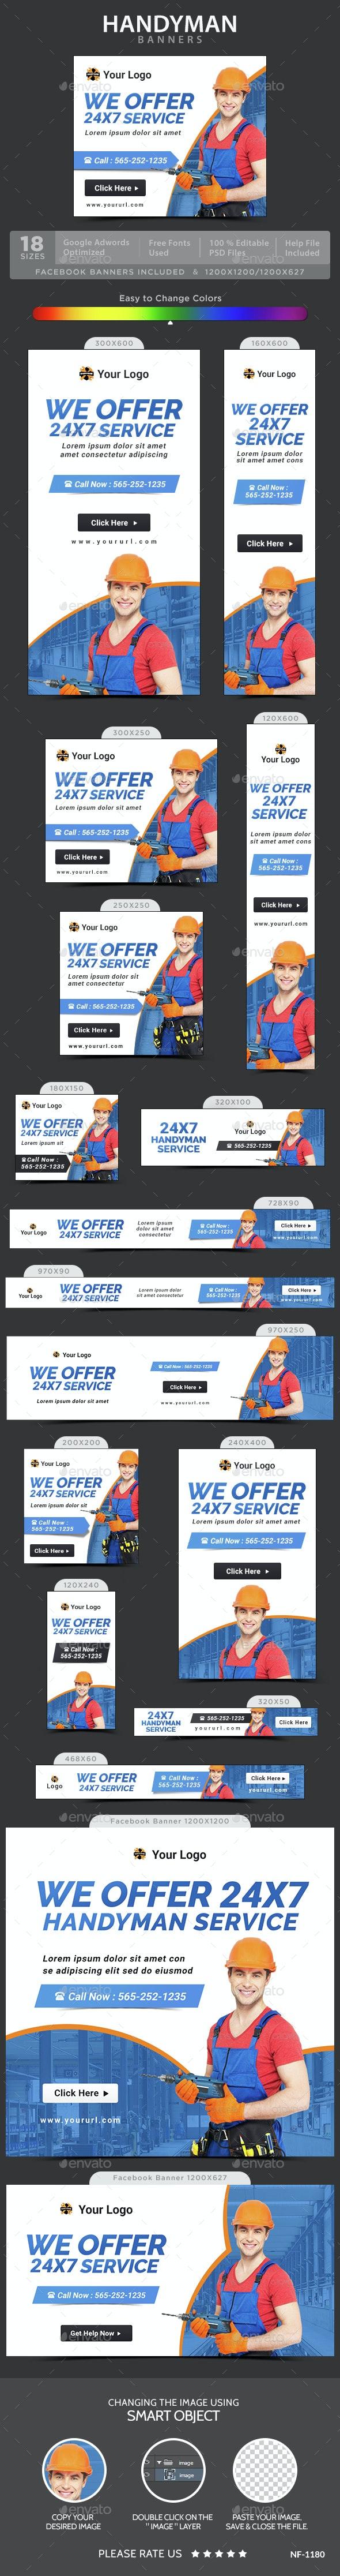 Handyman Banners - Banners & Ads Web Elements